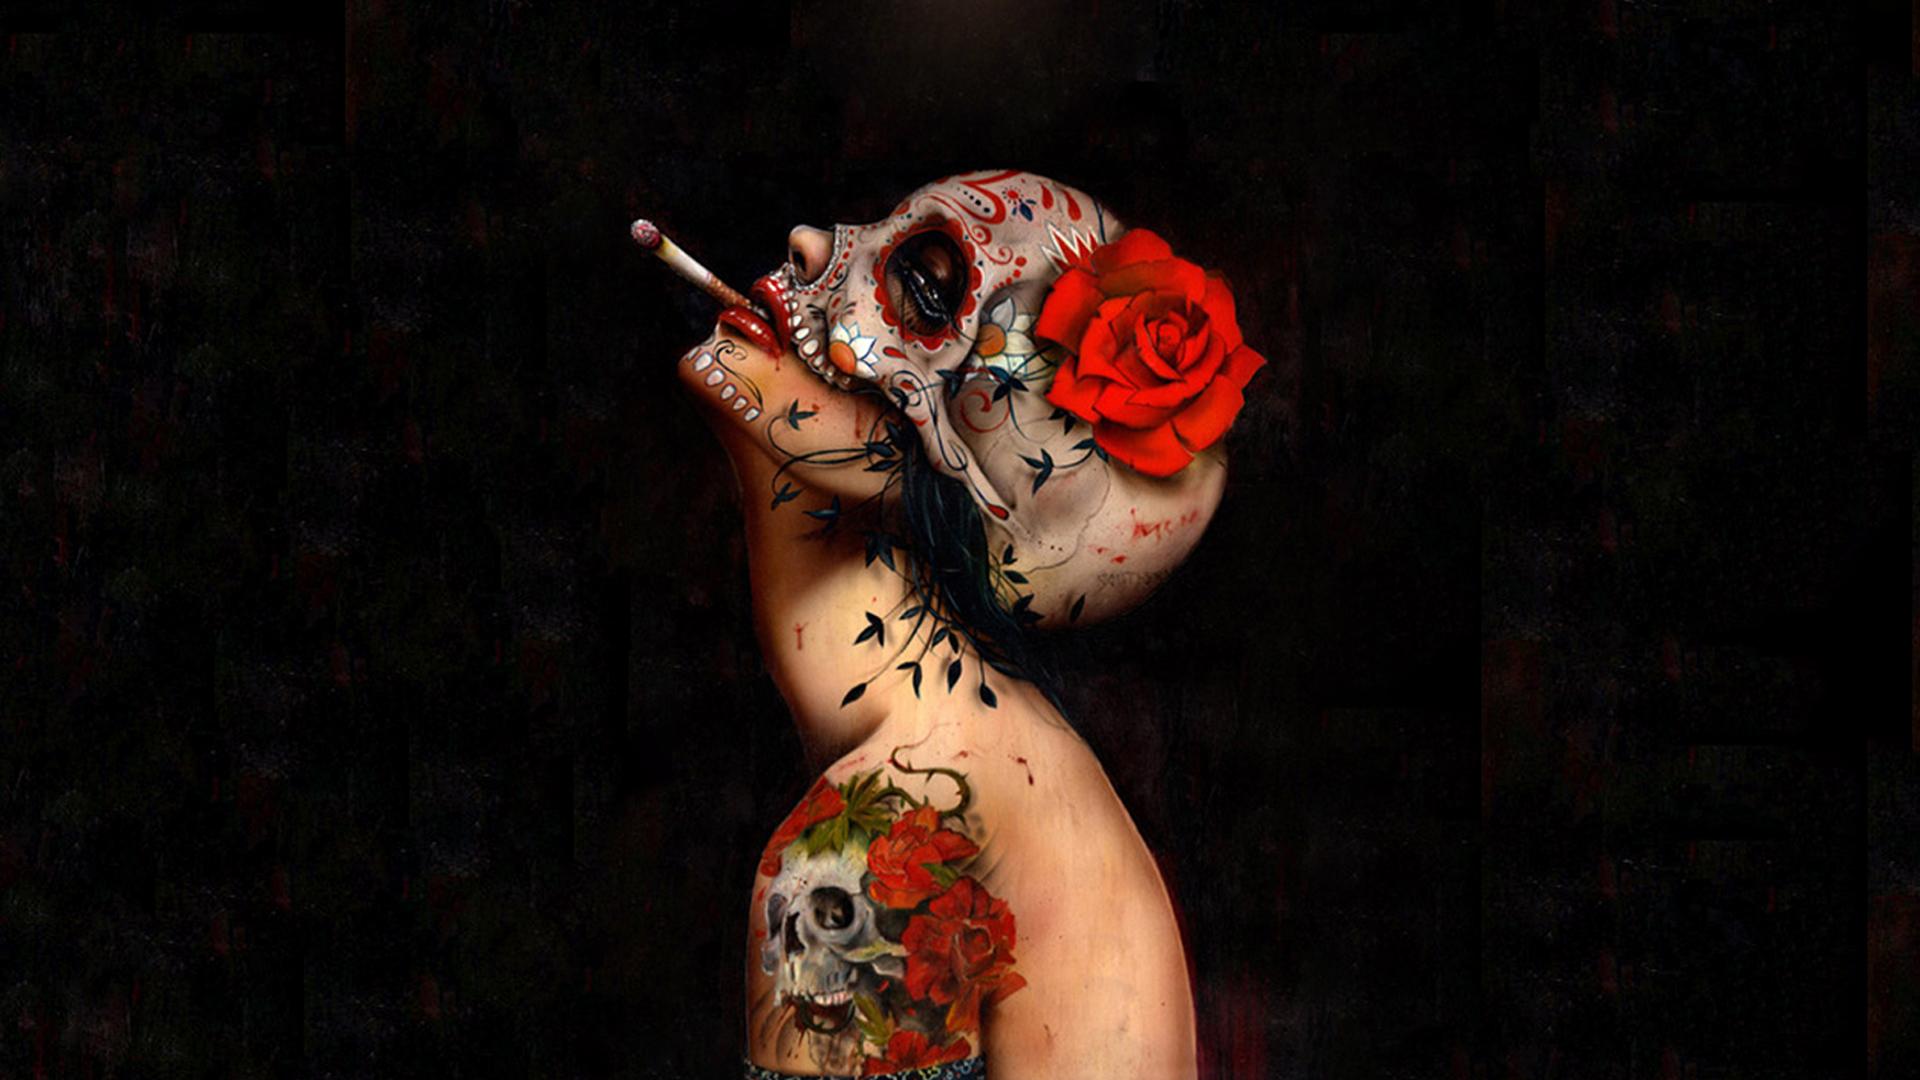 Sugar skull hd wallpaper background image 1920x1080 id 633277 wallpaper abyss - Sugar skull background ...